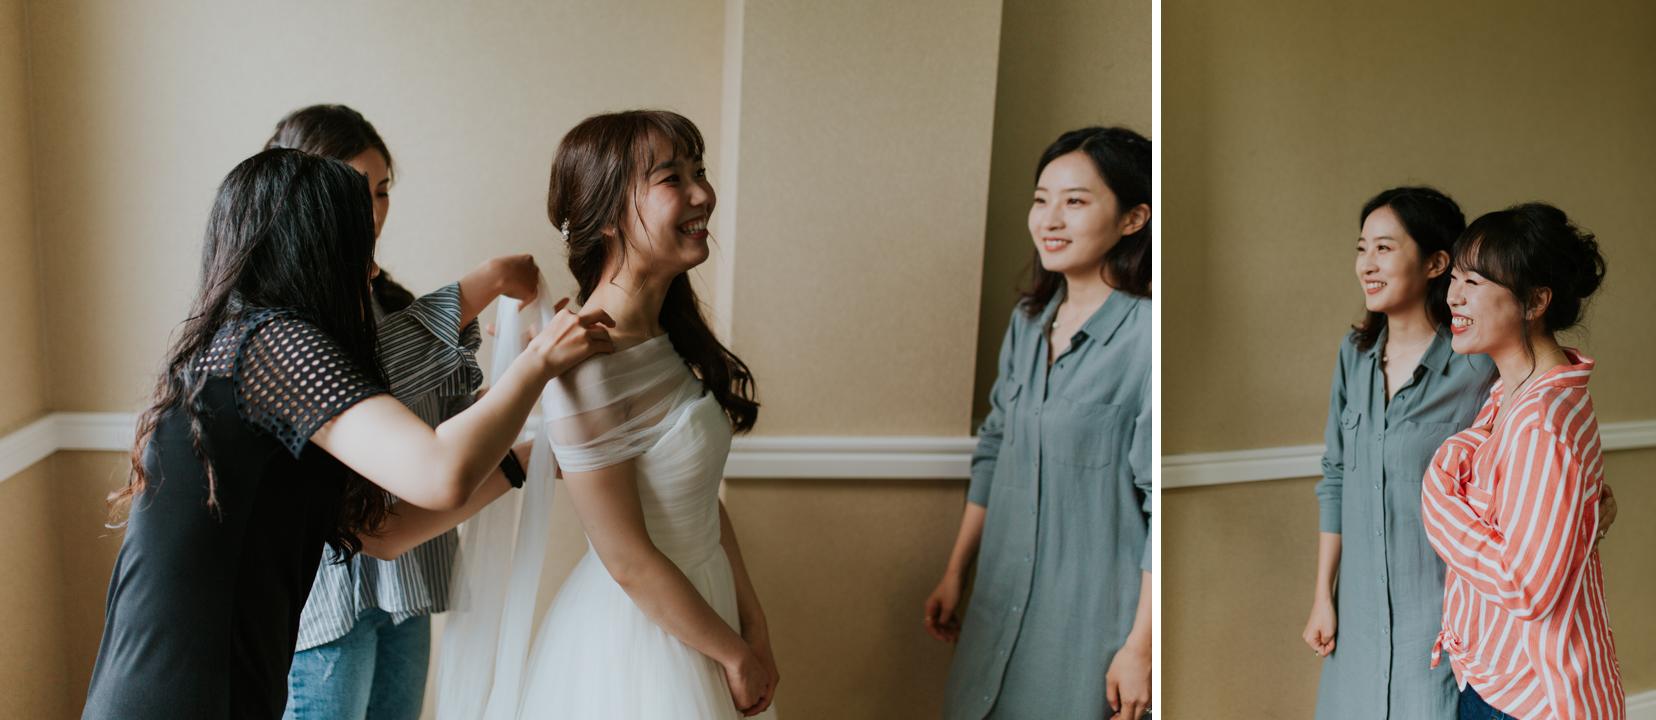 LGP-ann-arbor-eagle-crest-wedding-009.jpg